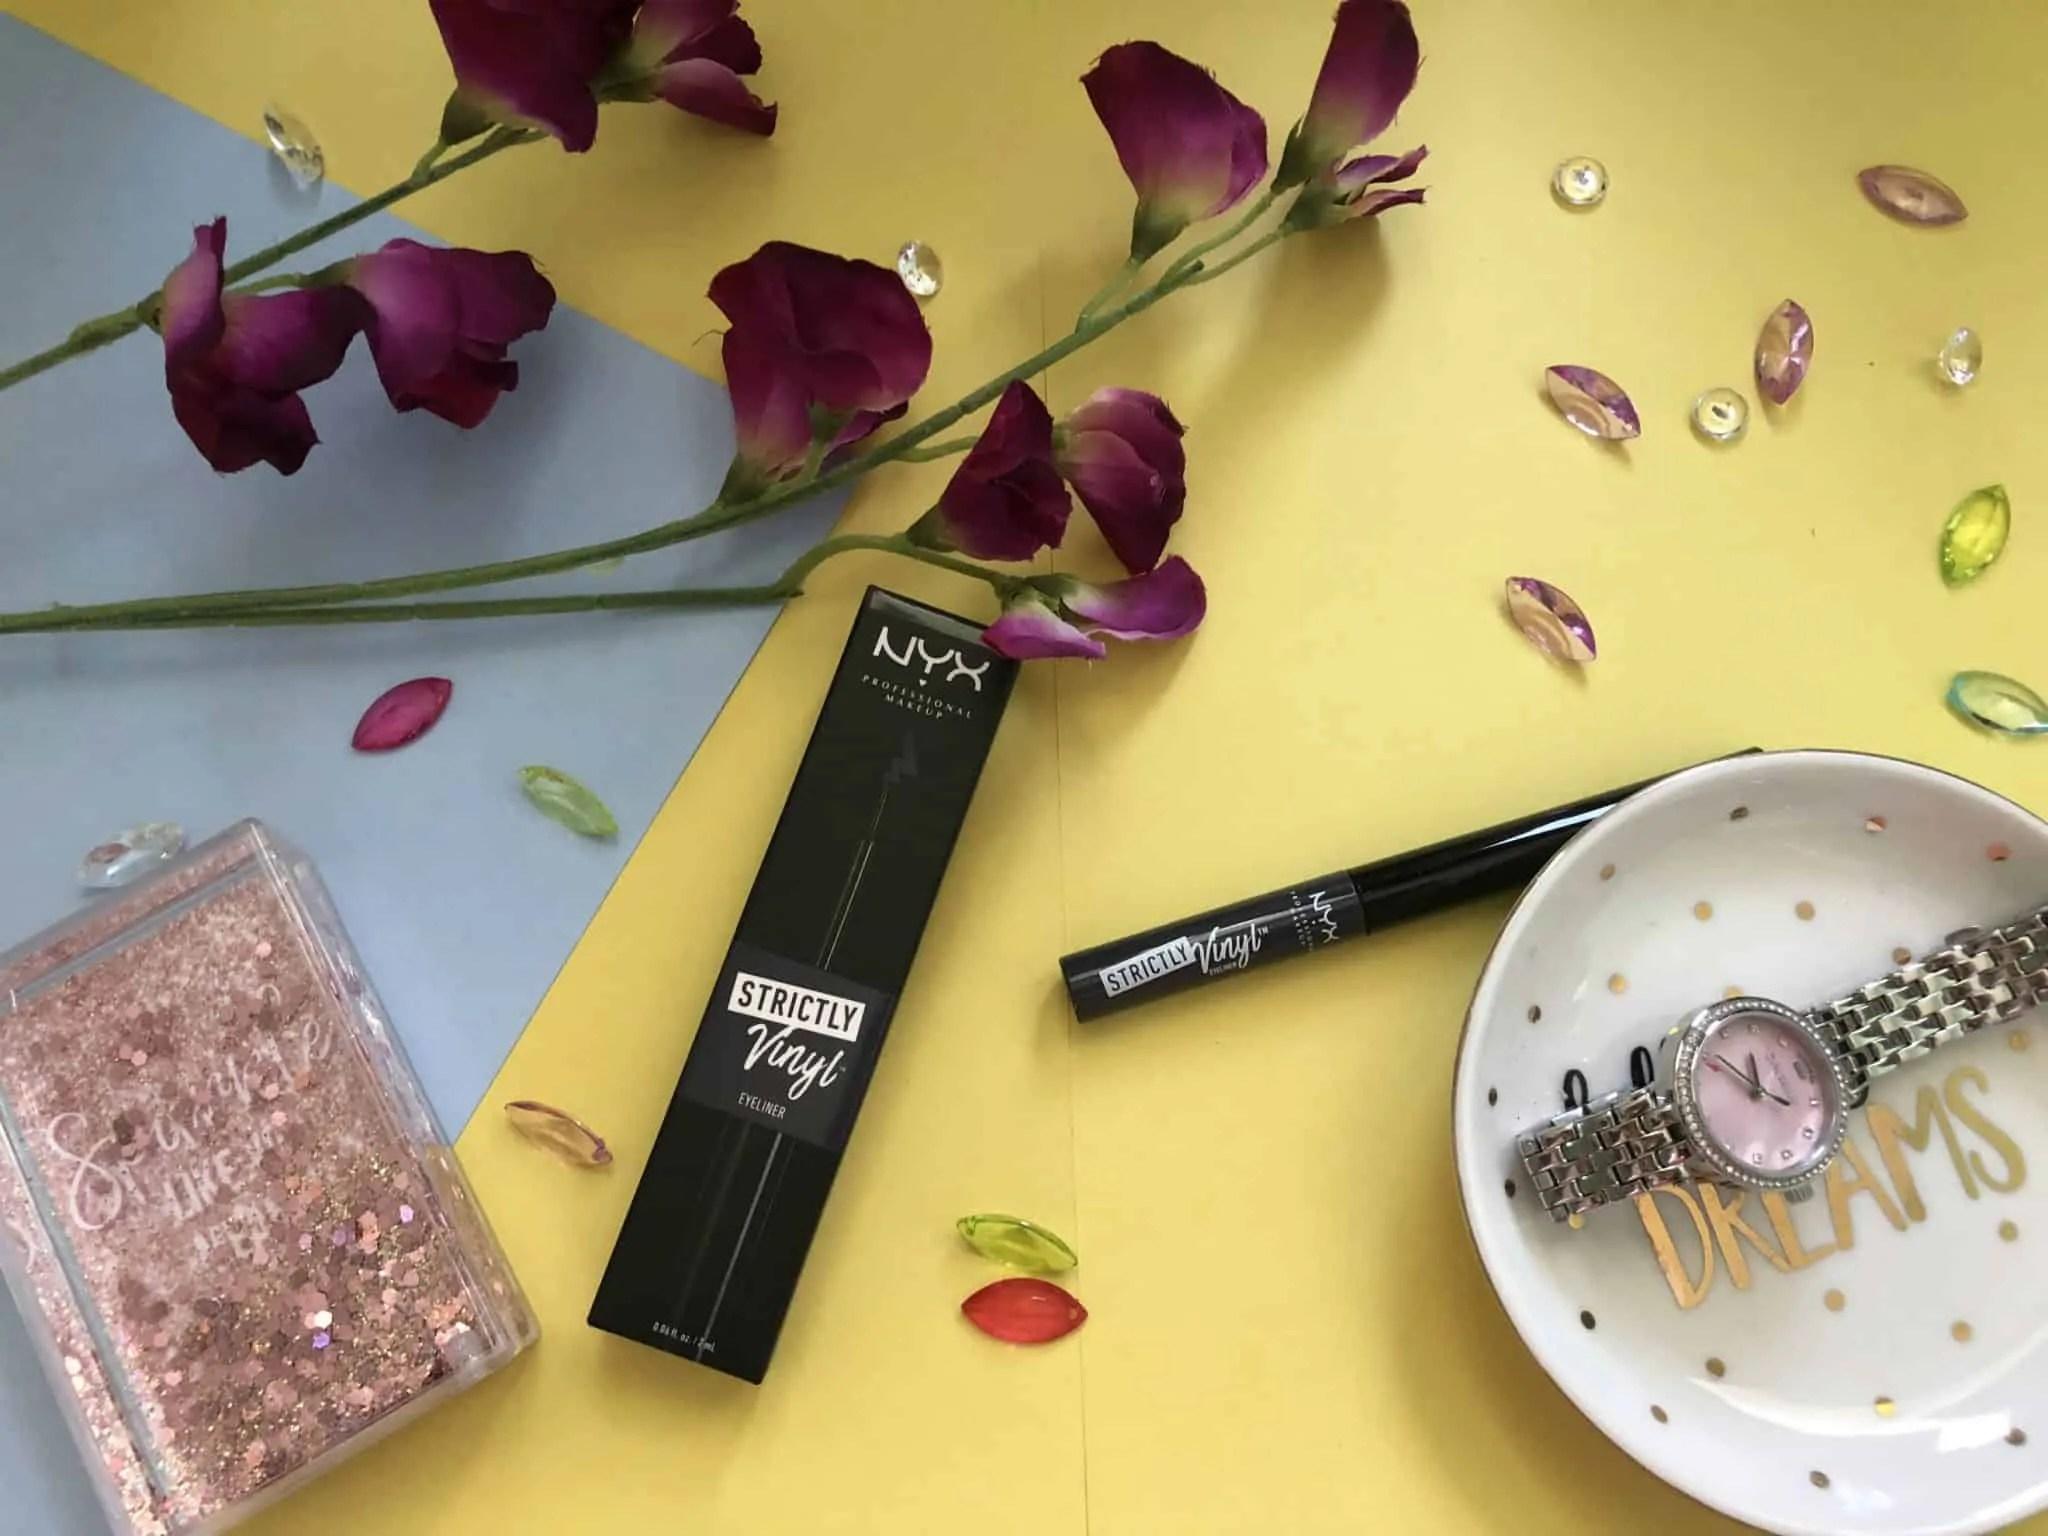 nyx strictly vinyl liquid eyeliner review